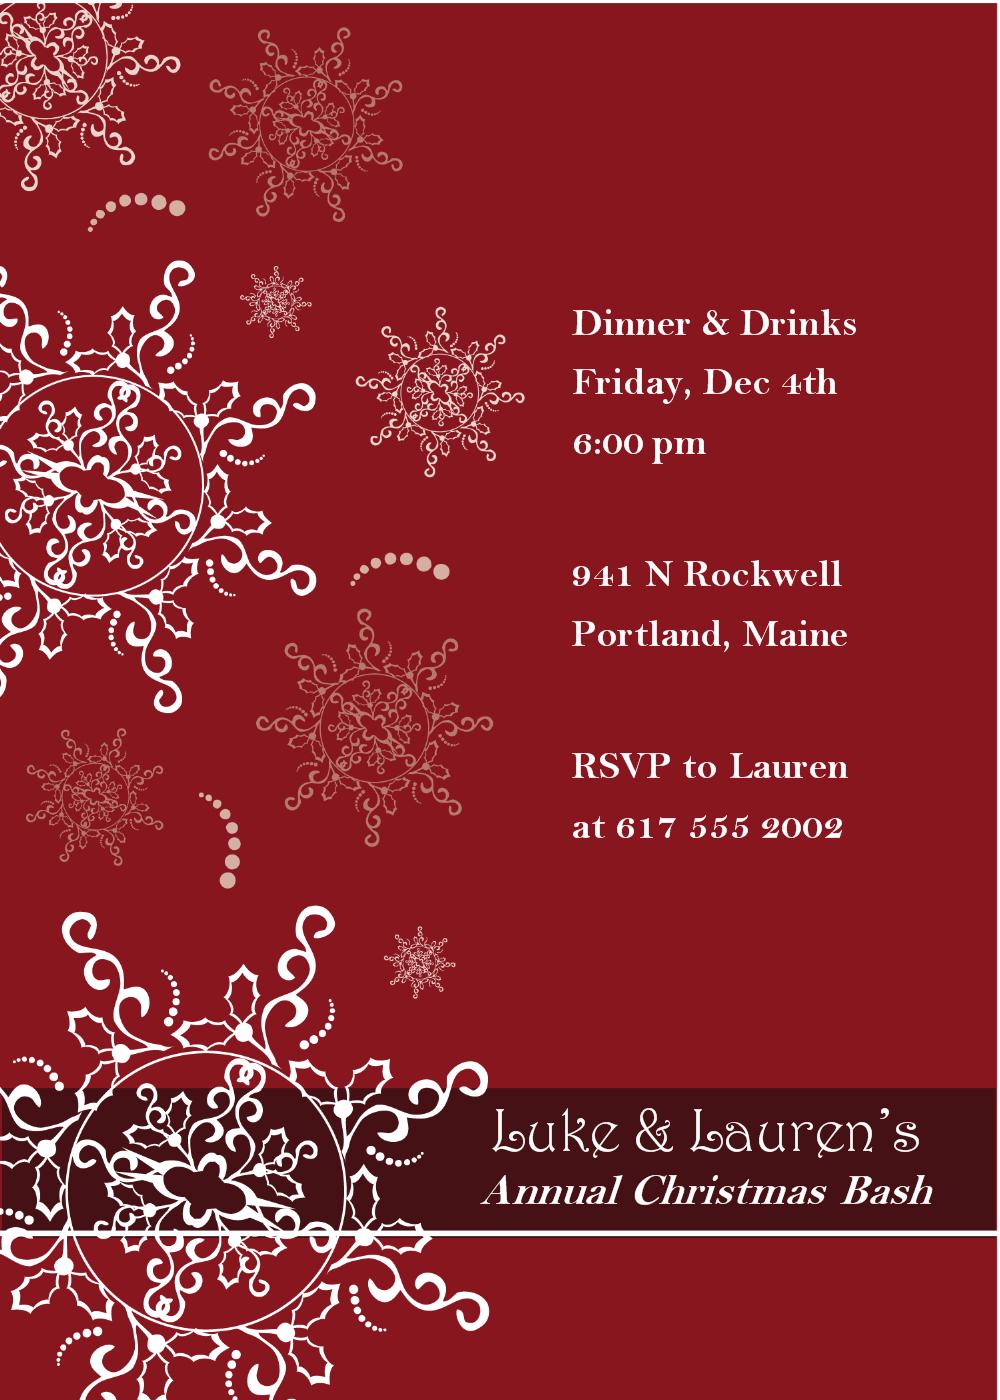 Christmas Party Invitation Templates - Bing Images   Christmas Card - Christmas Party Invitation Templates Free Printable